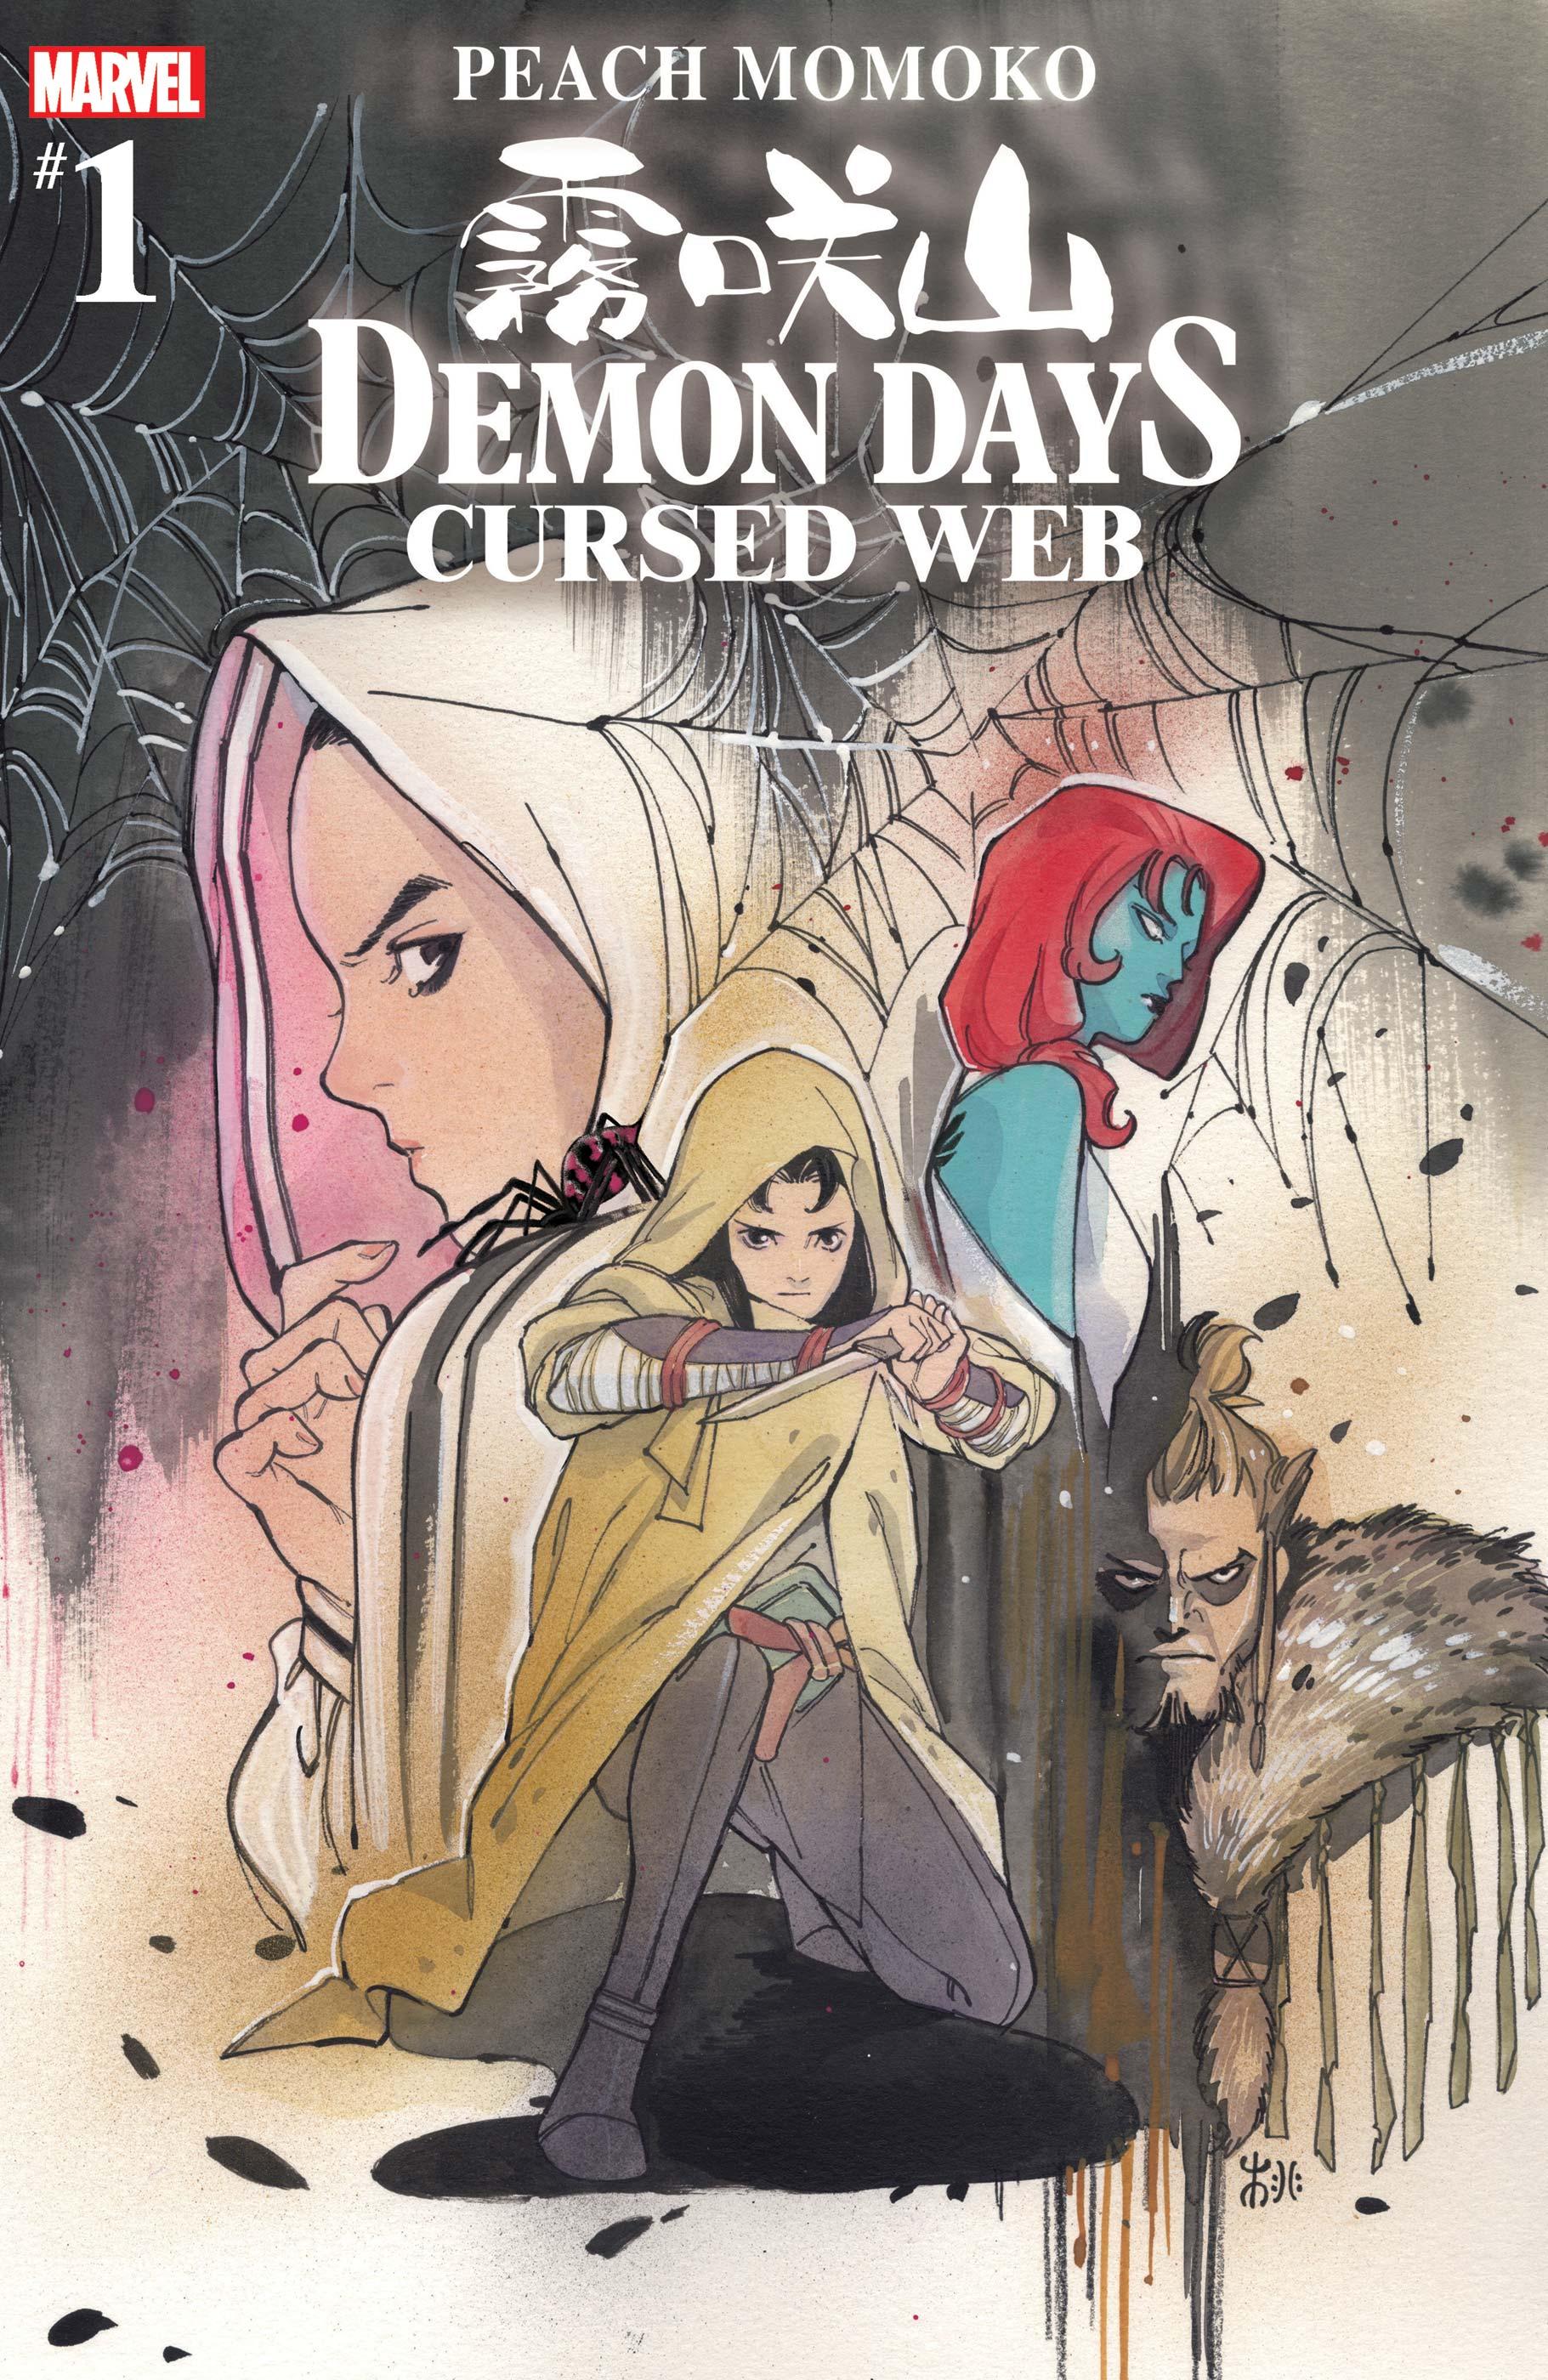 DEMON DAYS: CURSED WEB 1 (2021) #1